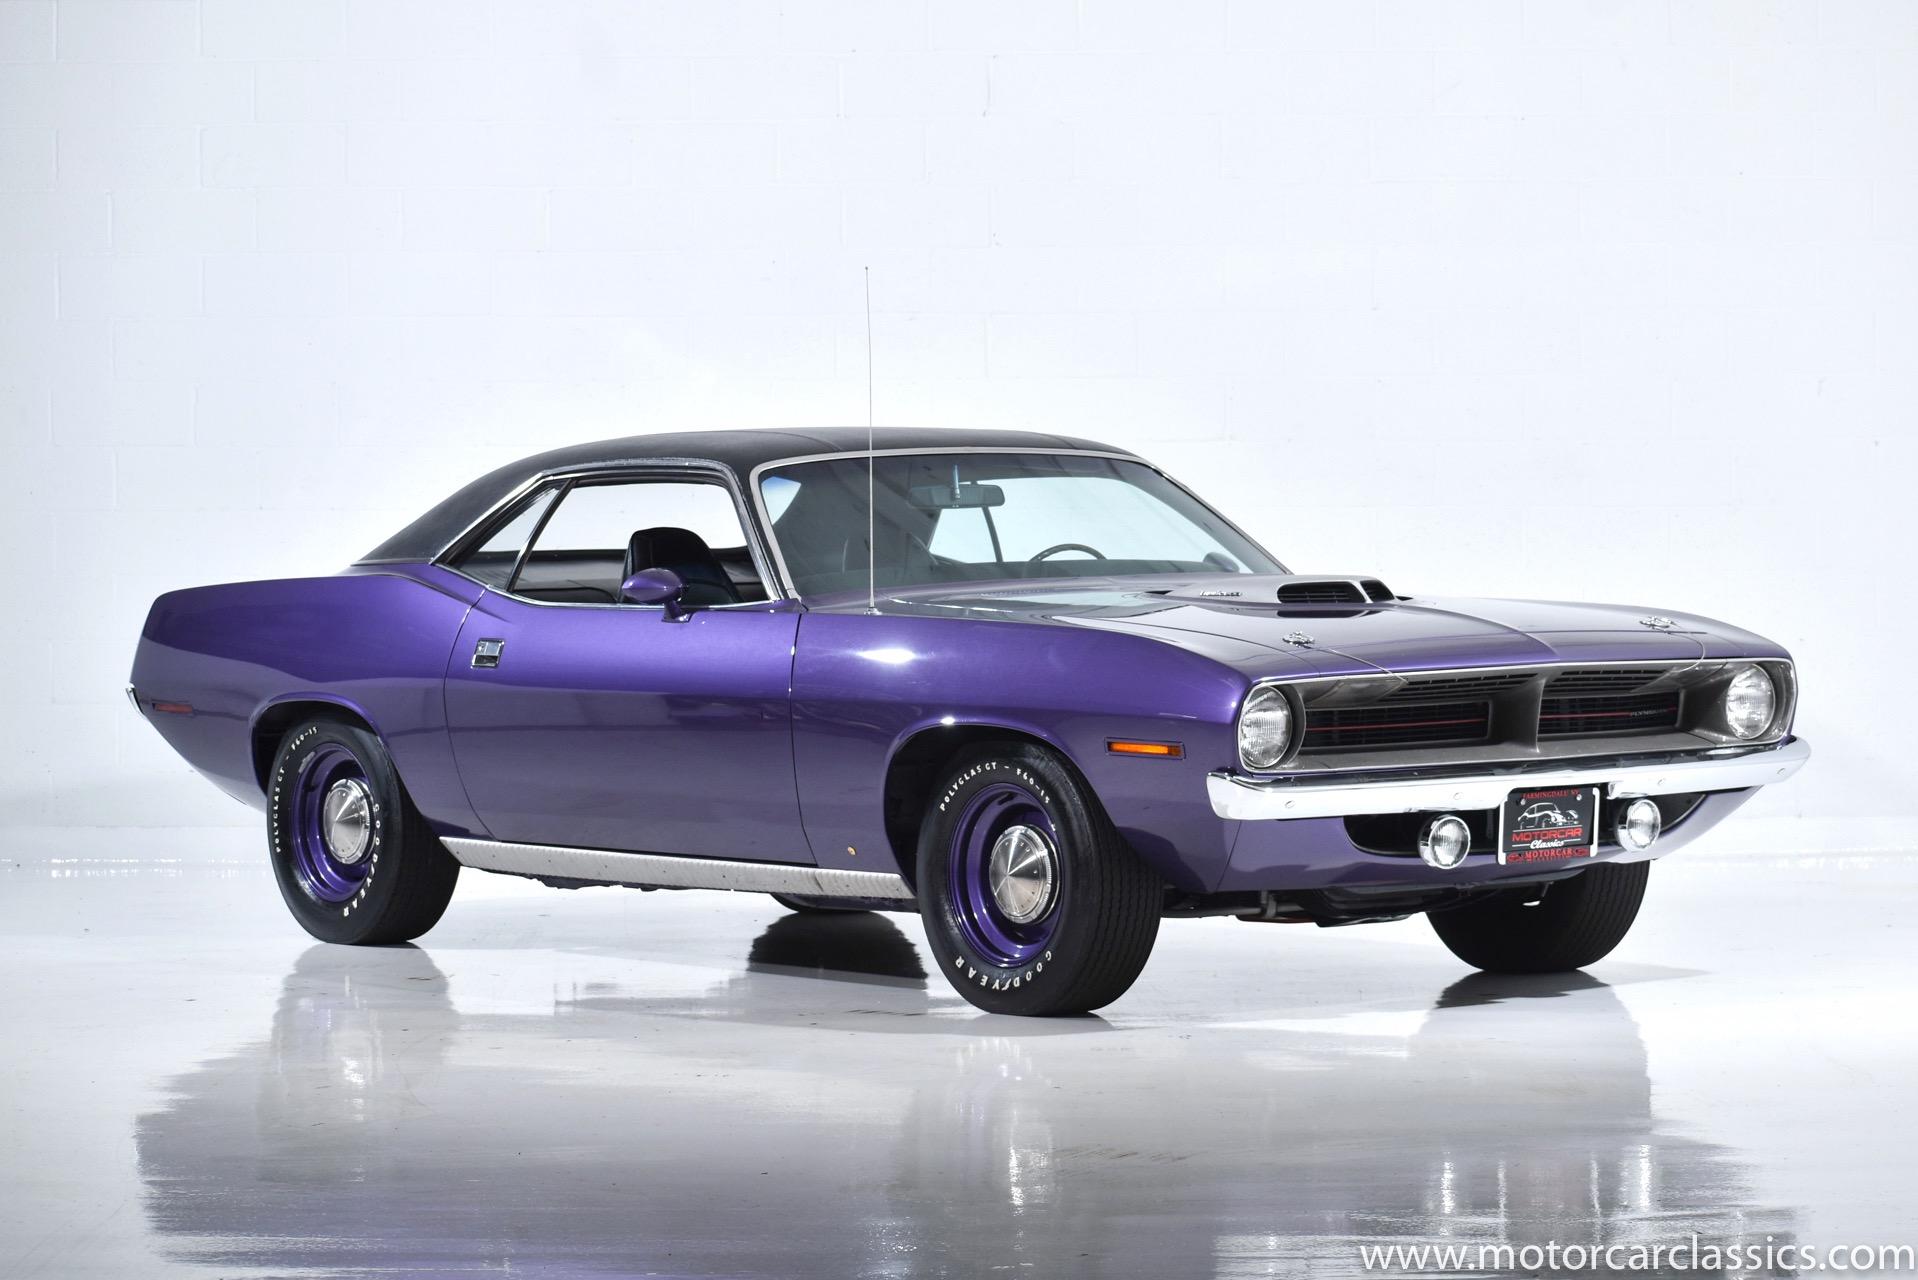 Used 1970 Plymouth Barracuda Hemi For Sale 199 900 Motorcar